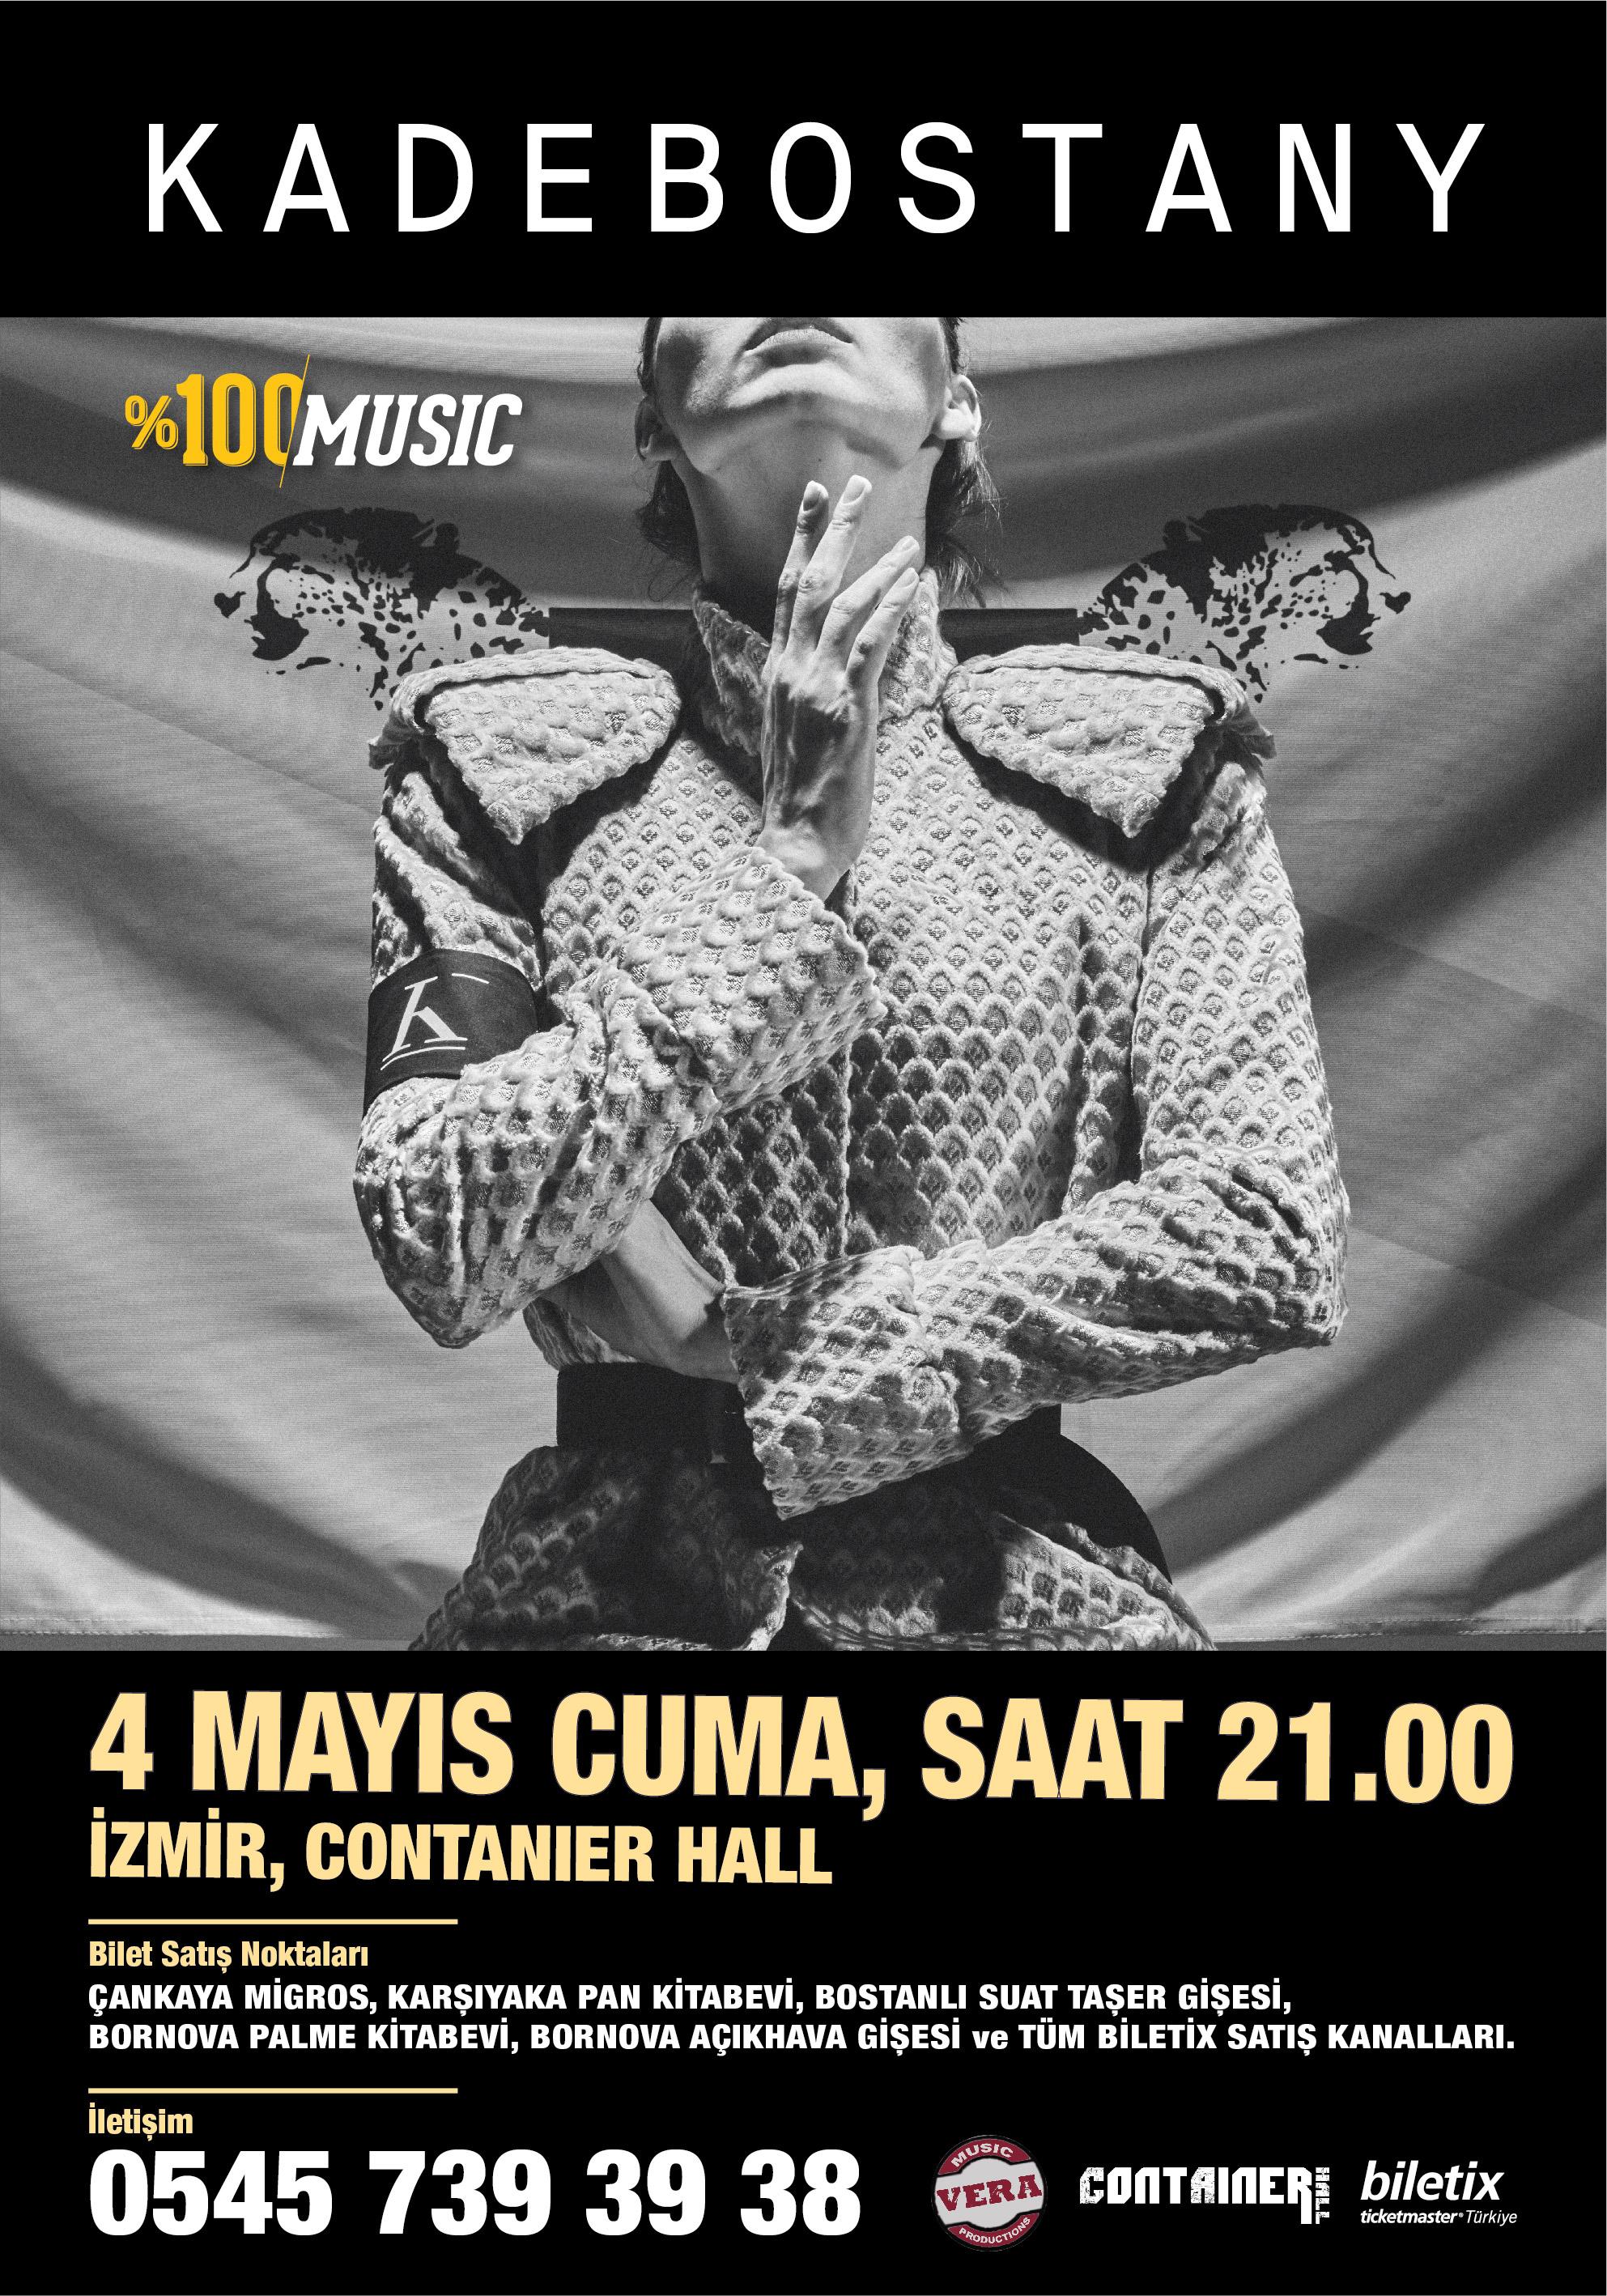 Kadebostany Ankara poster (2)